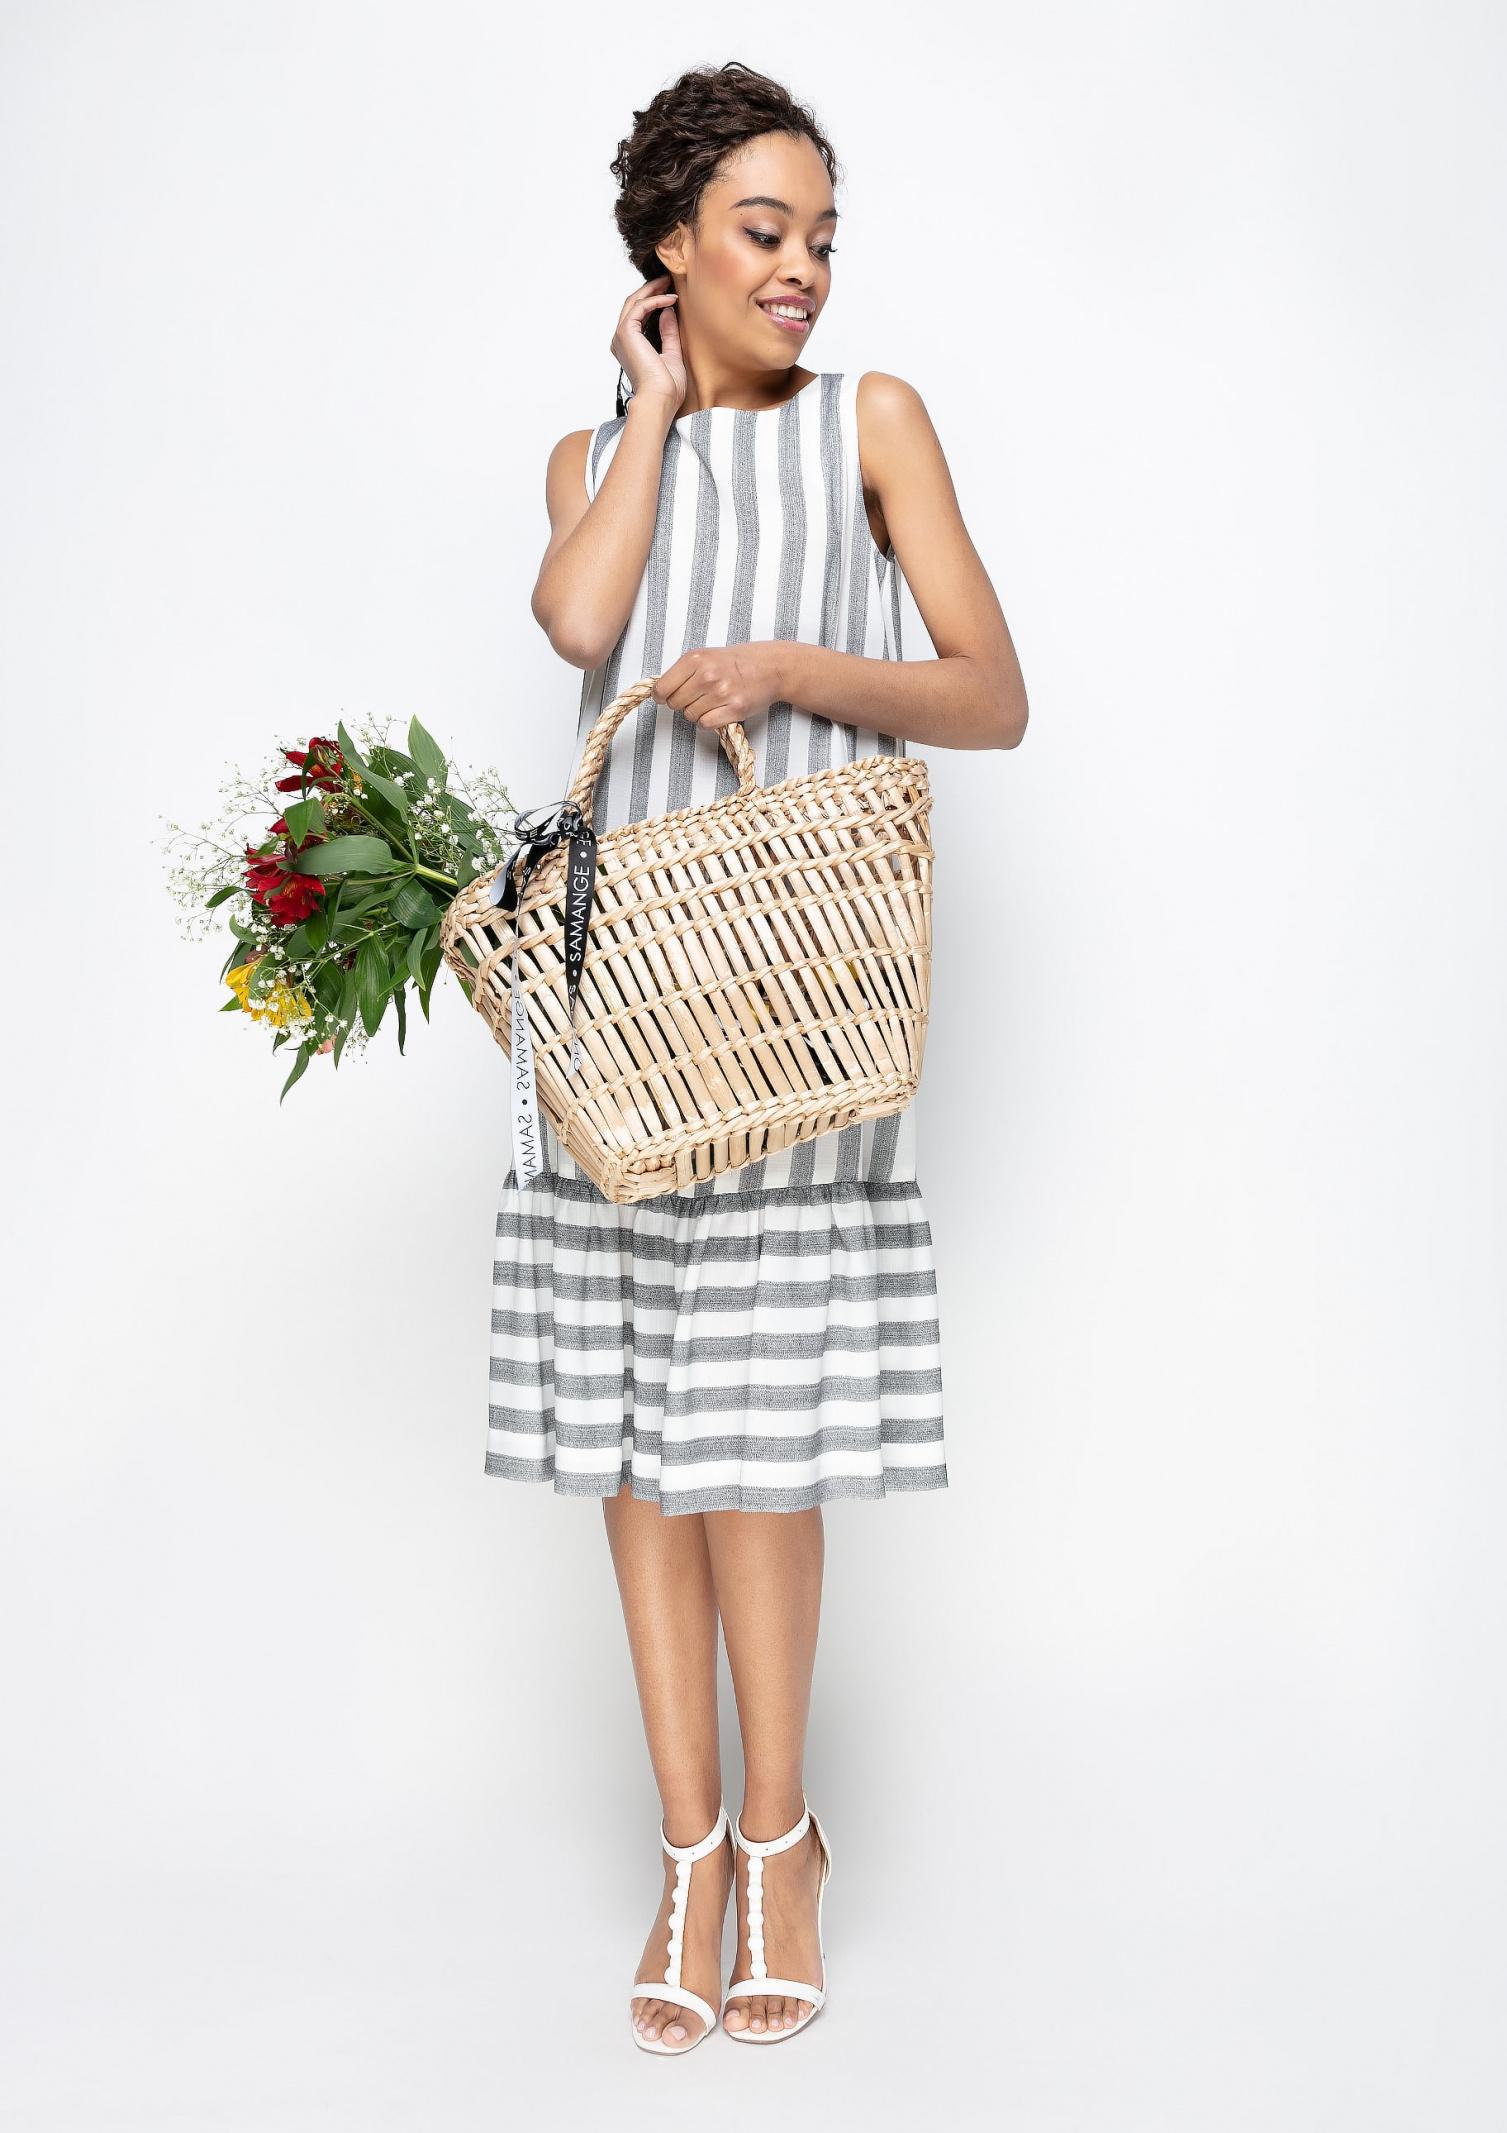 Samange Сукня жіночі модель 30DS_304 , 2017